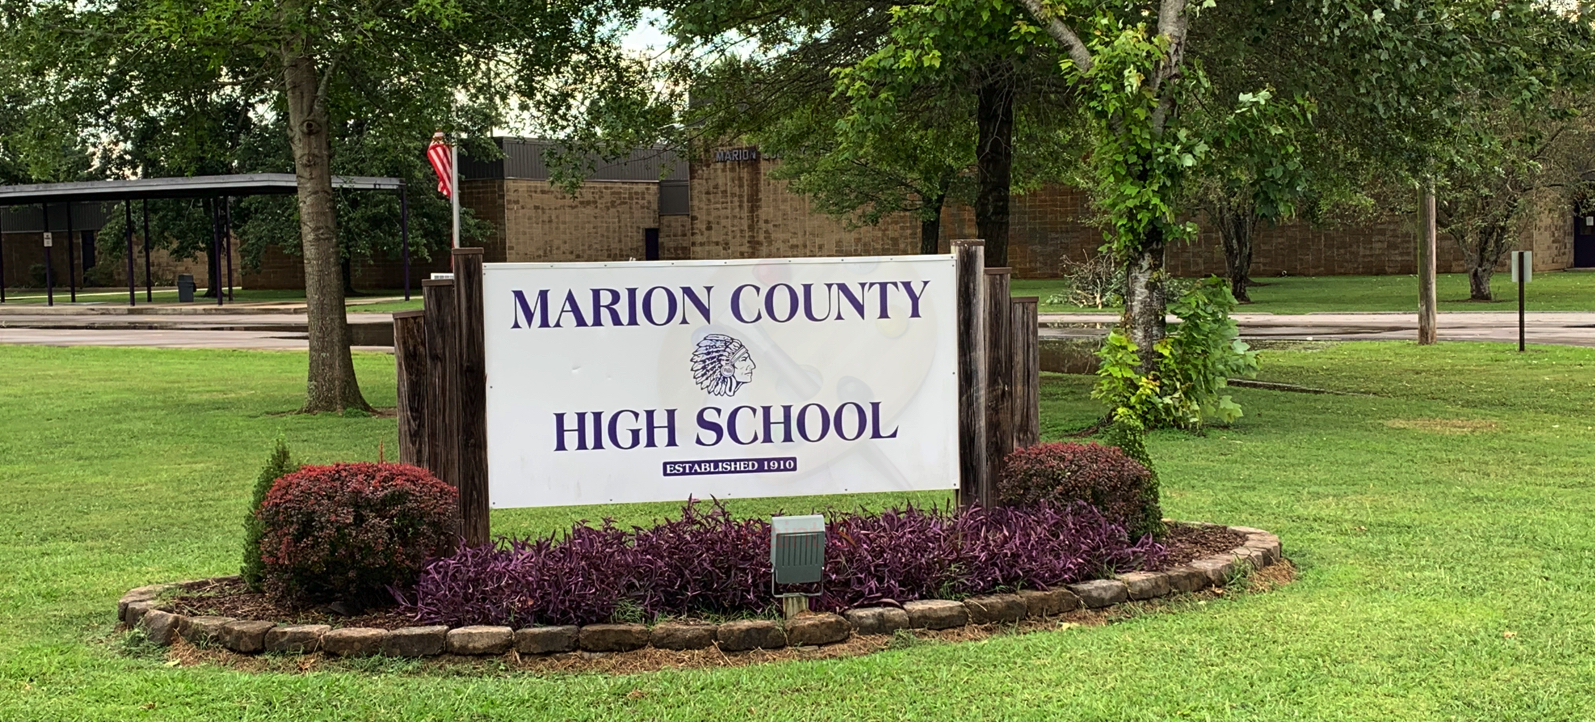 Home – Marion County High School Regarding School Calendar 2021 2020 Marion County Fl